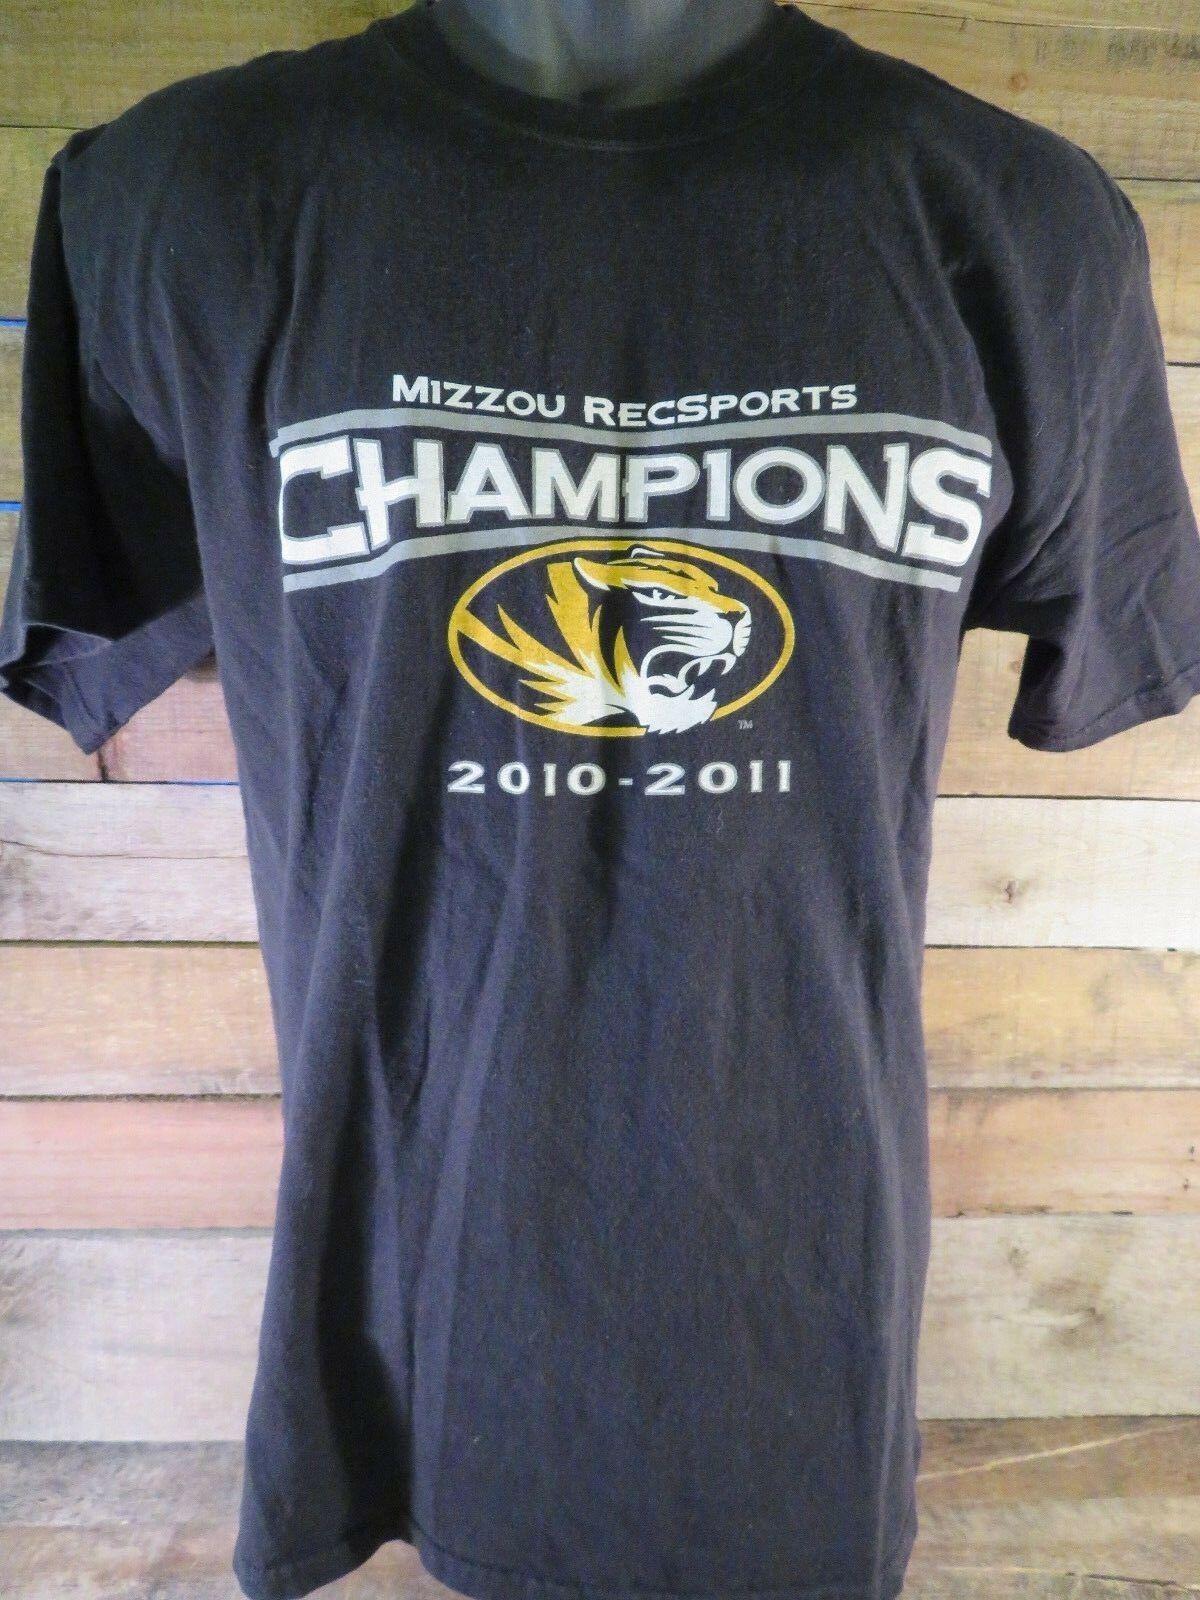 Mizzou Recsports Champions 2010-2011 T-Shirt Taille M image 2